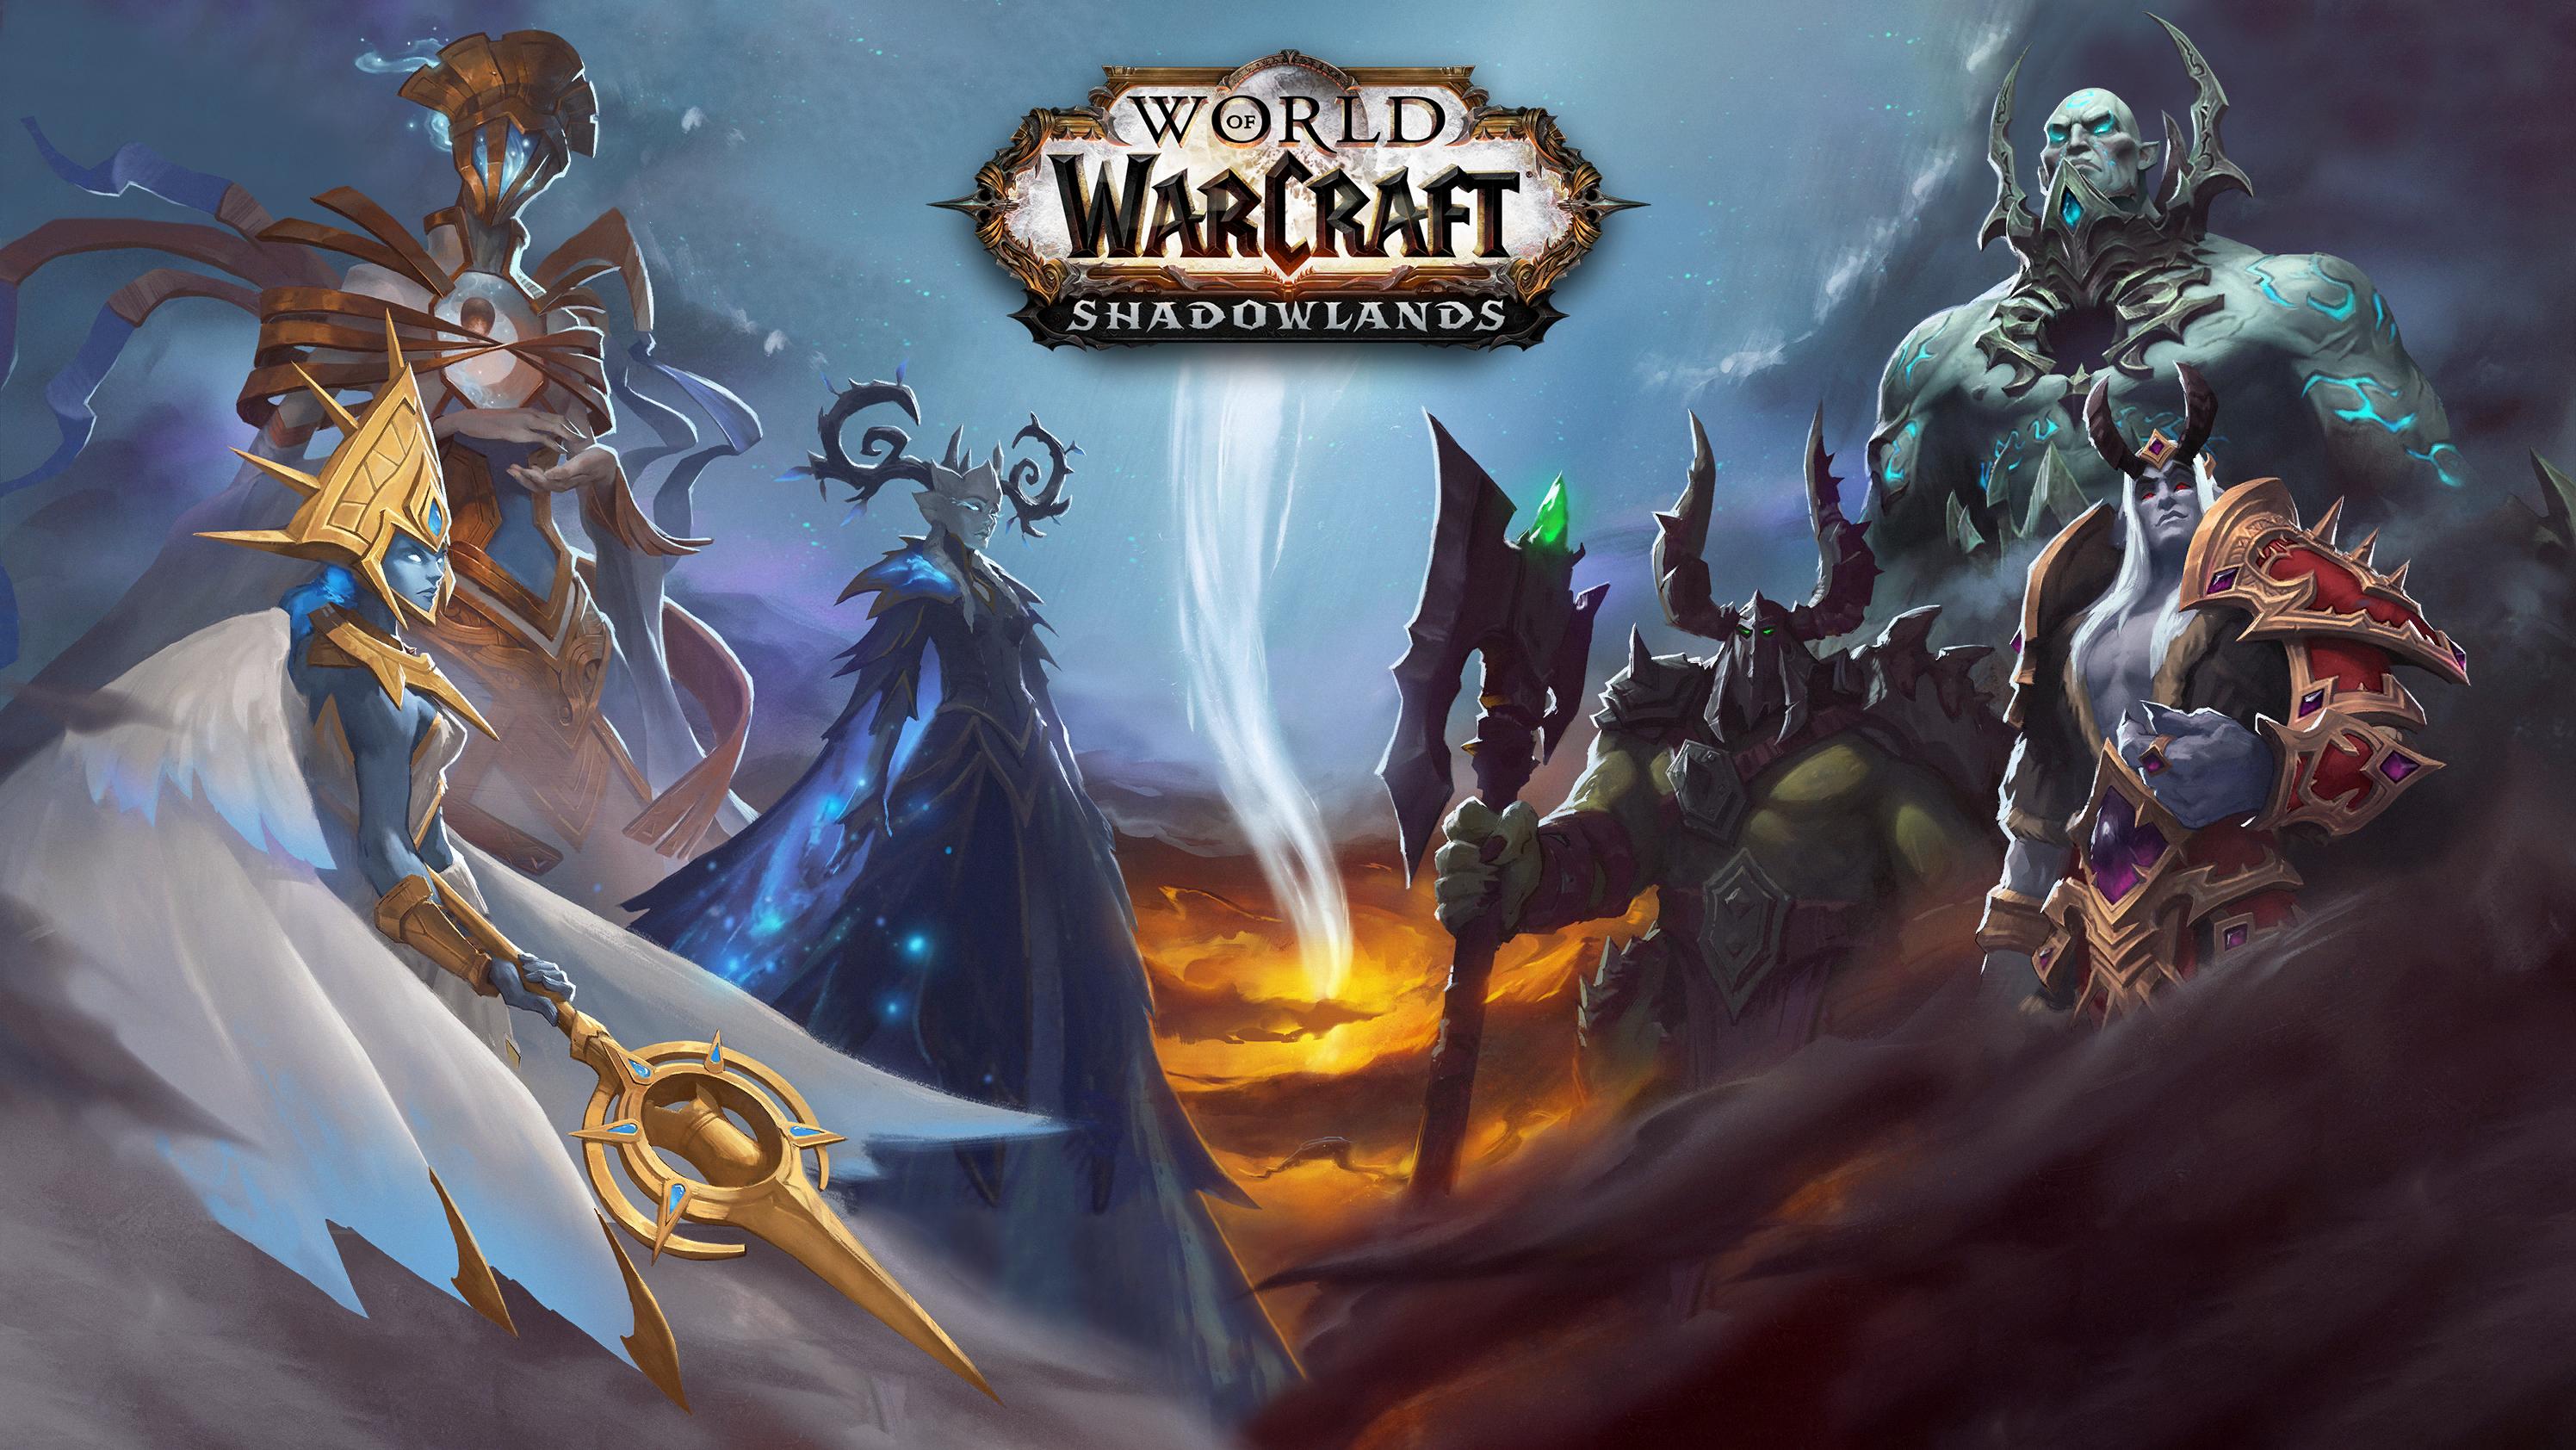 General 2992x1684 World of Warcraft: Shadowlands fantasy art video game art World of Warcraft